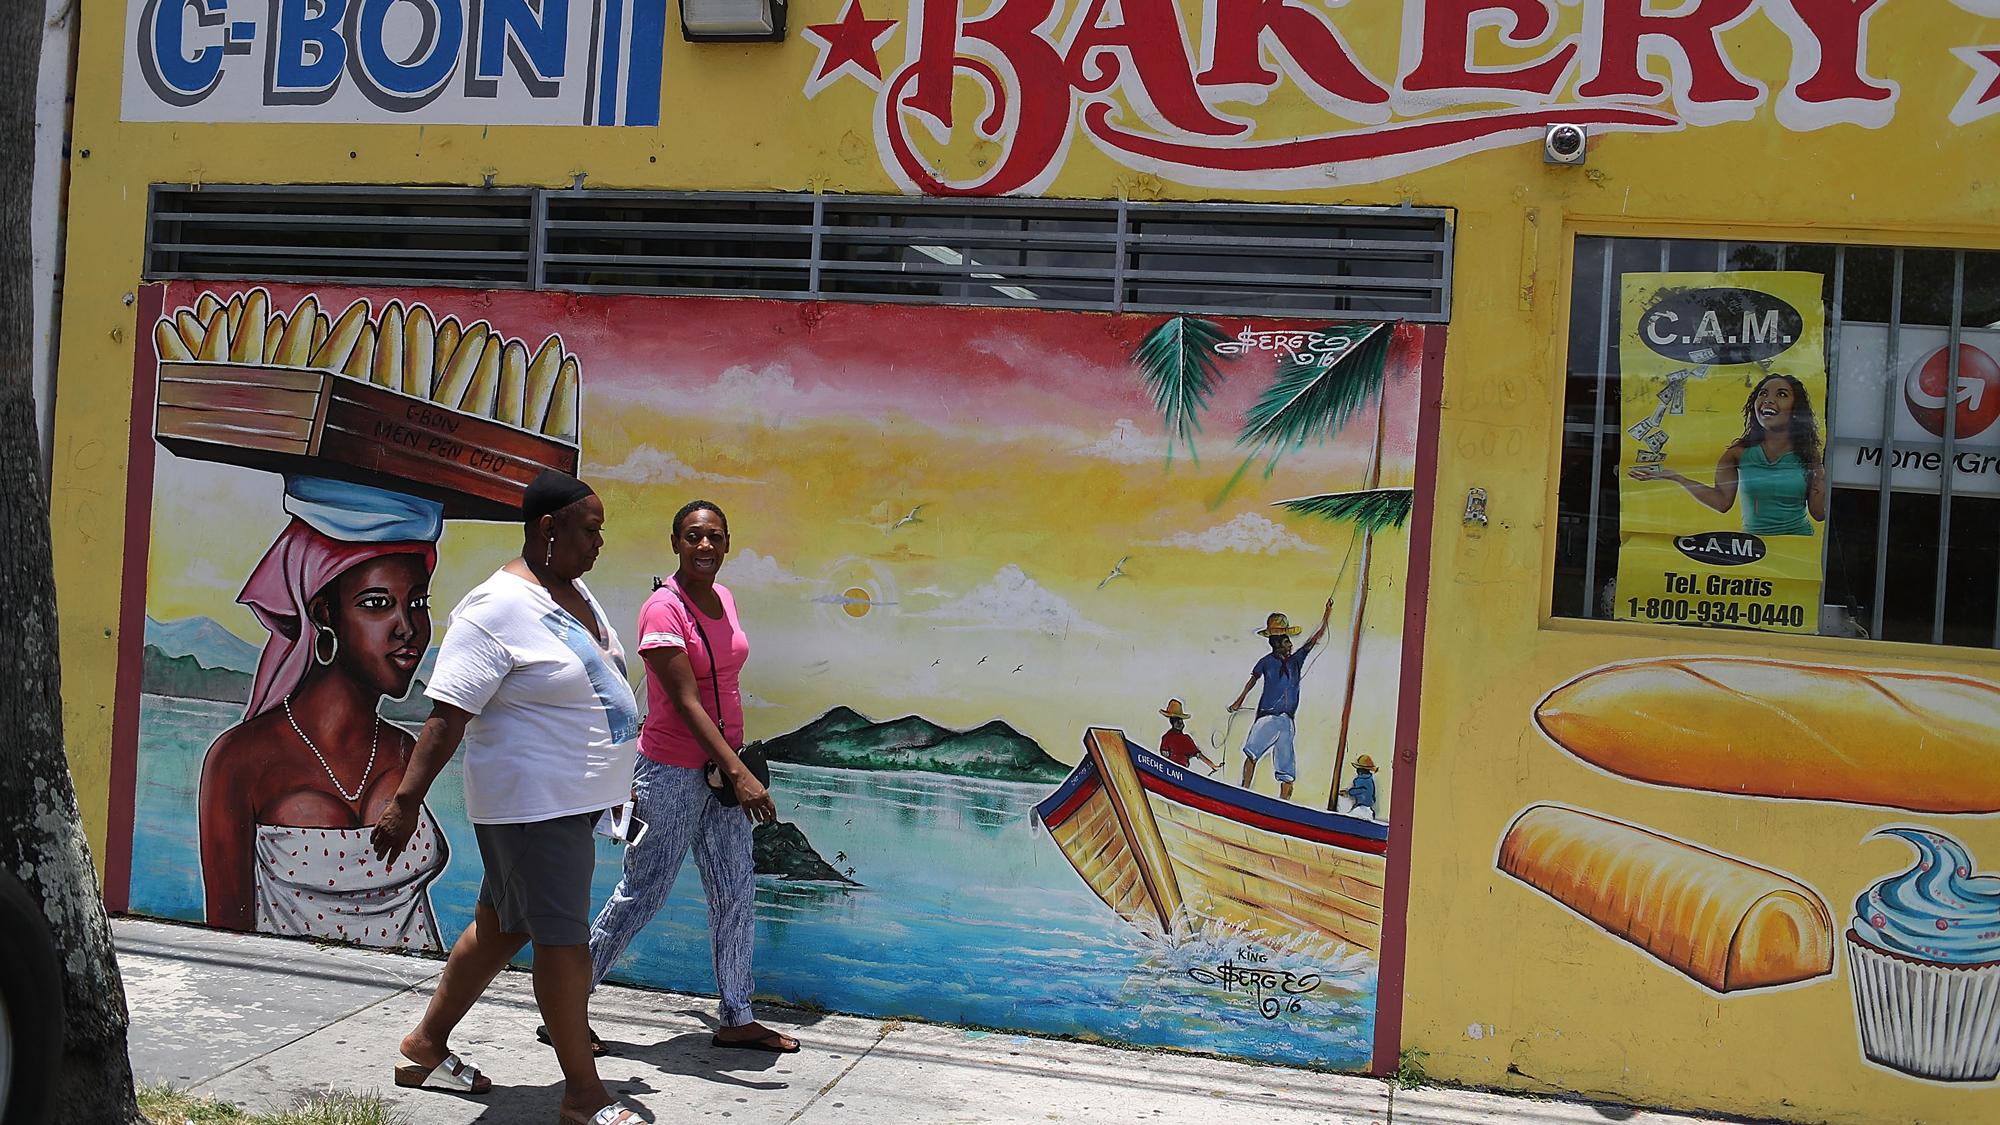 Women walk past a mural in the Little Haiti neighborhood in Miami, May 17, 2017.